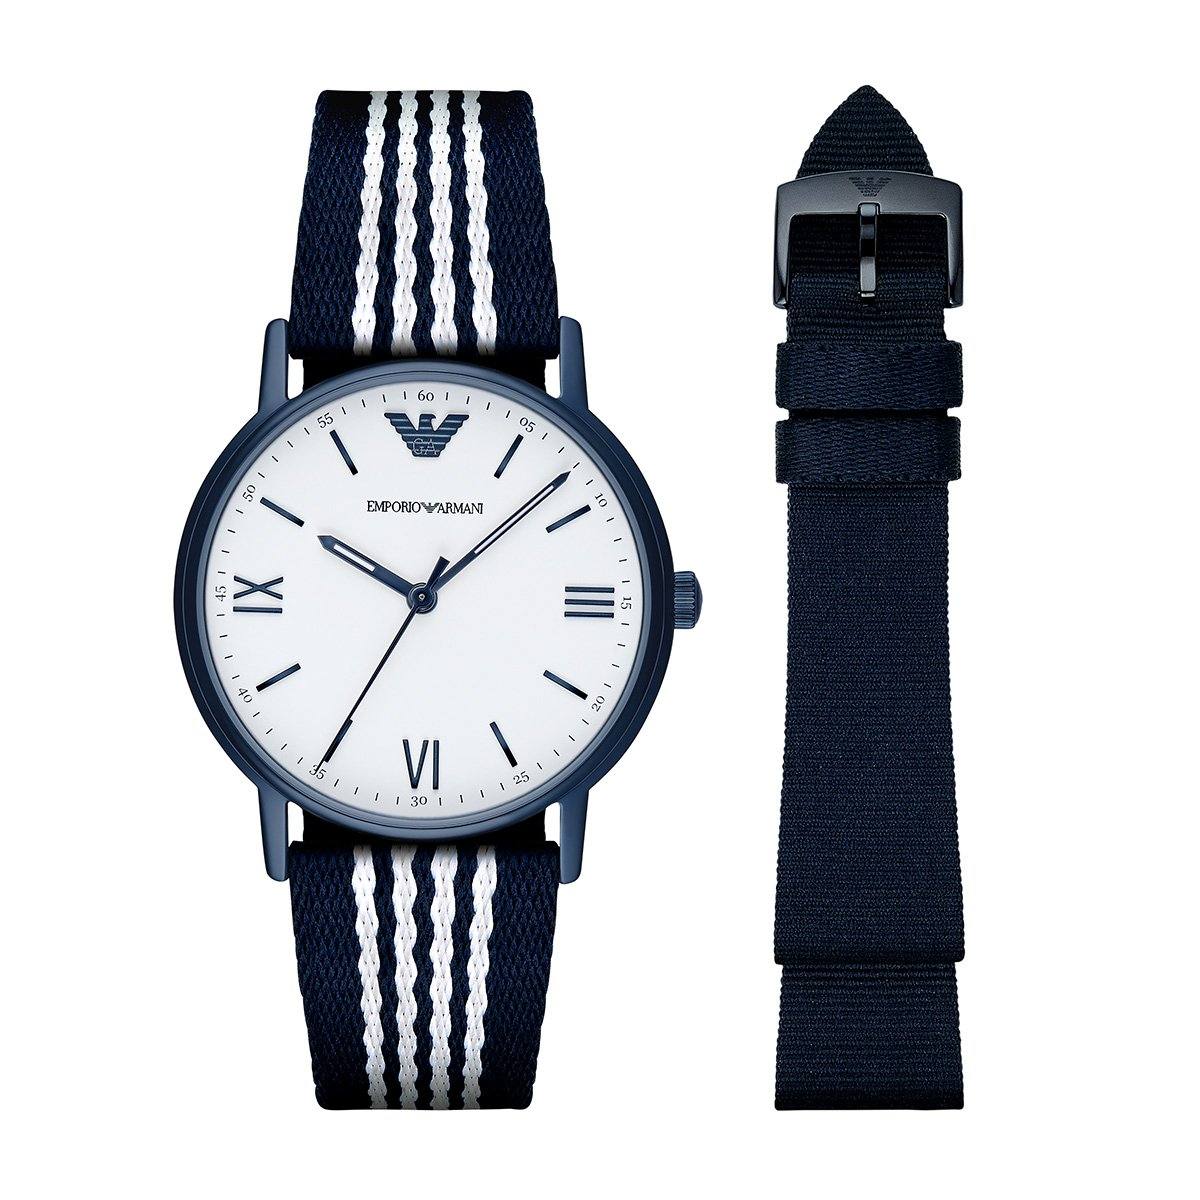 67817ec184a Relógio Emporio Armani Analógico AR800058BN Masculino - Compre Agora ...